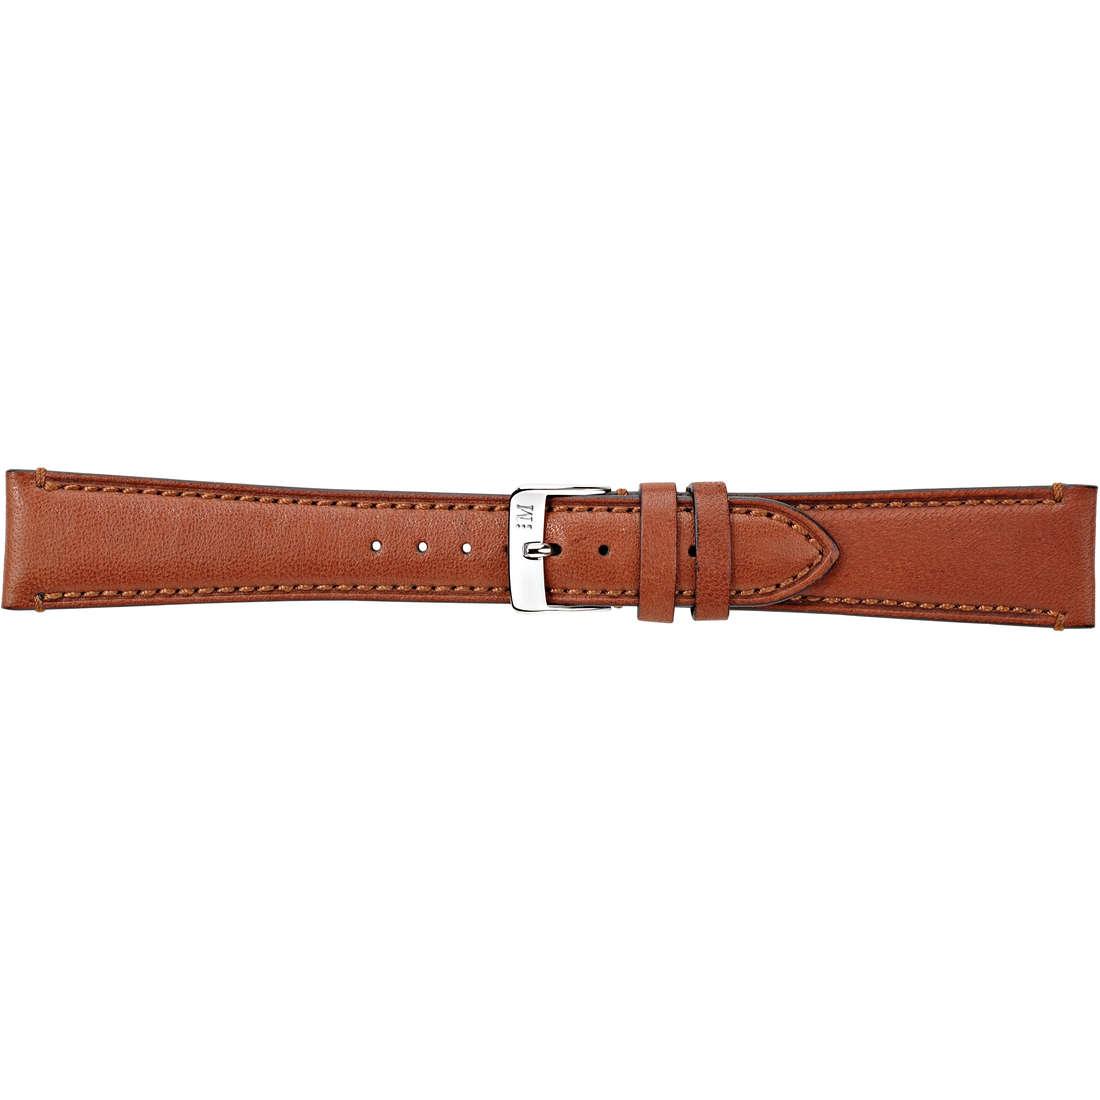 watch watch bands watch straps man Morellato Manufatti A01X3495006041CR14